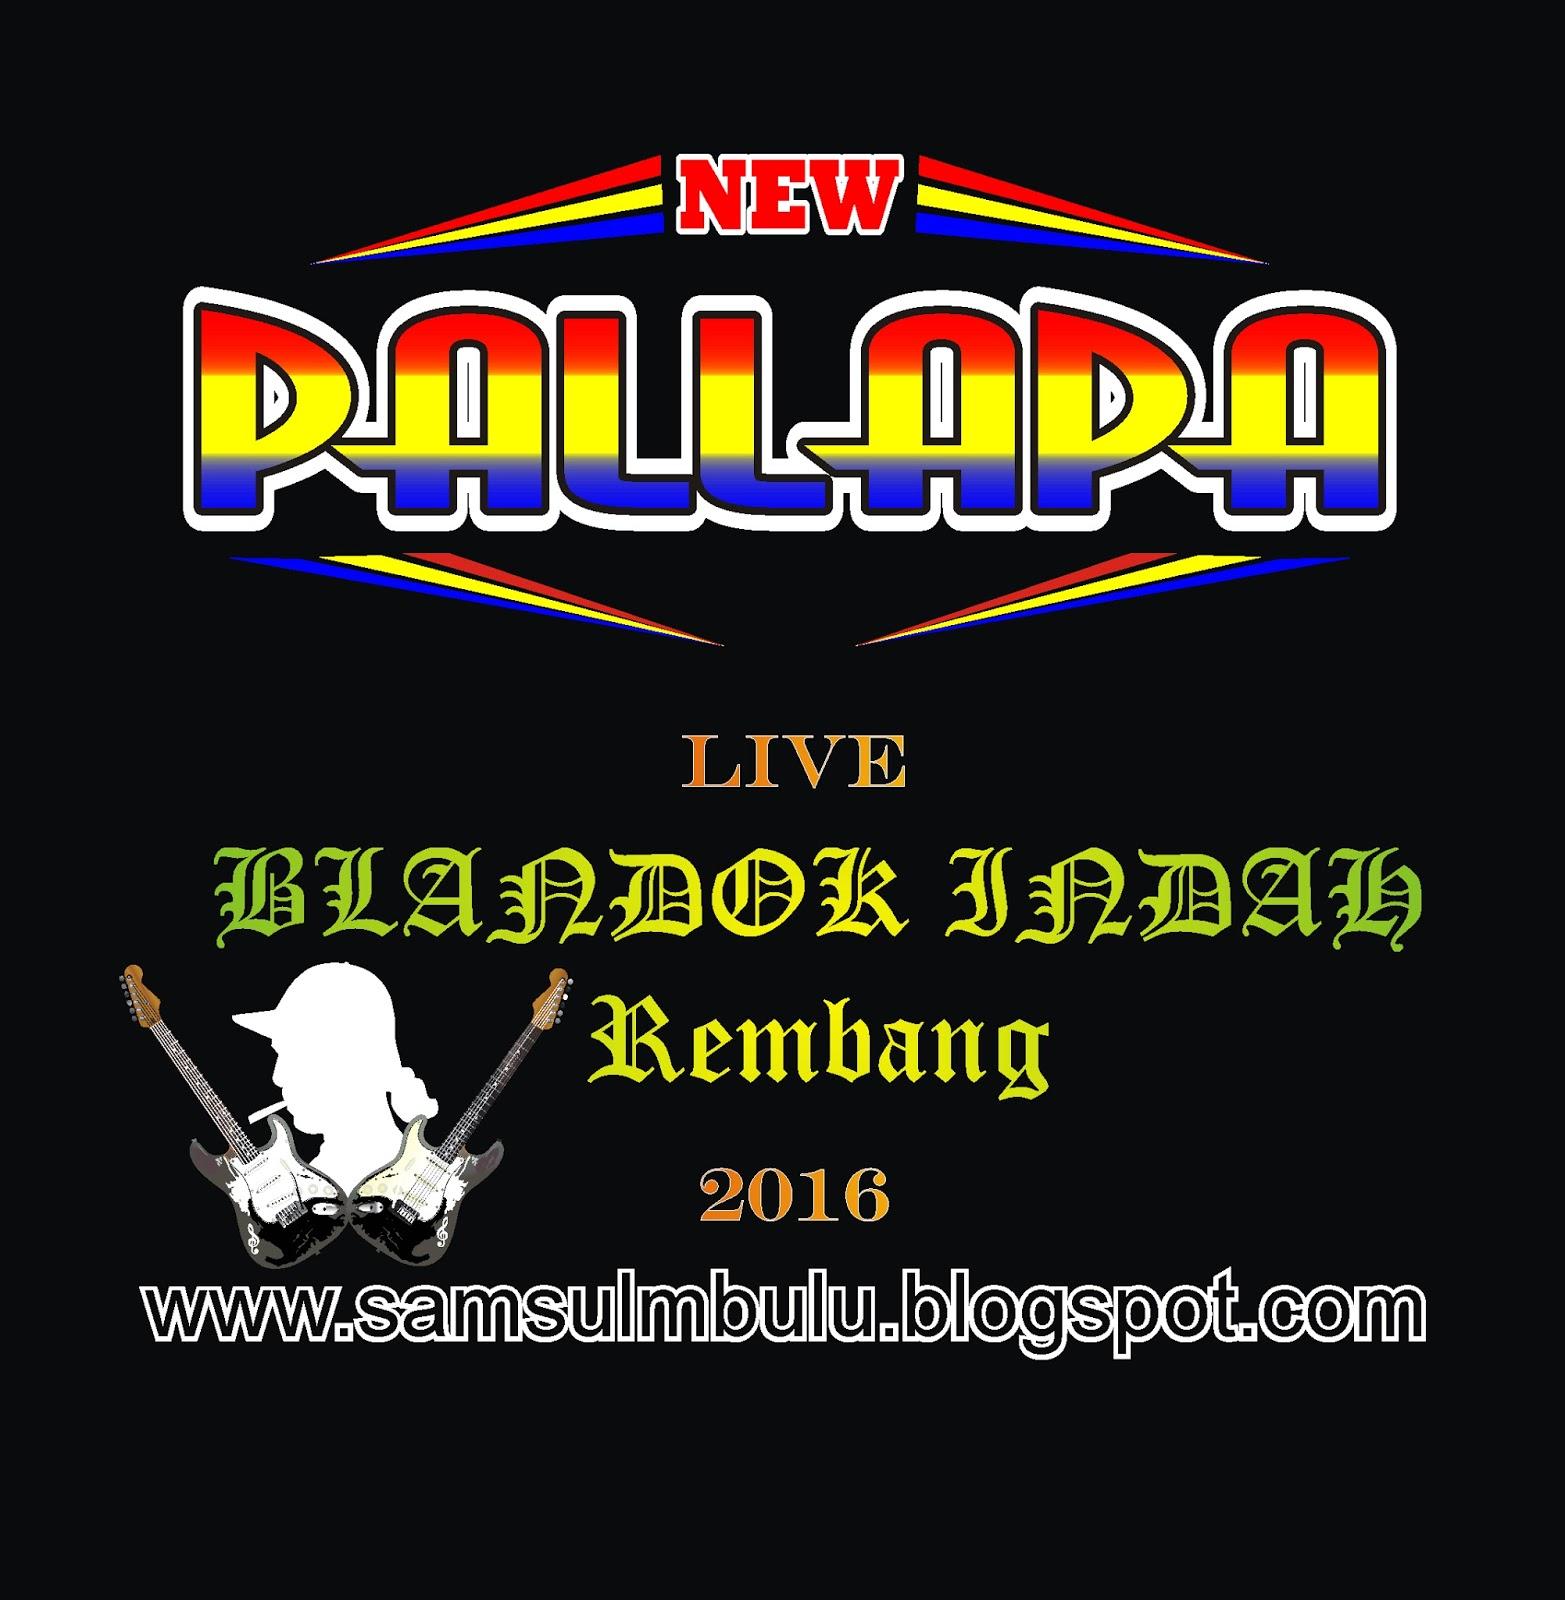 Donlod Lagu Dangdut Terbaru: Download Dangdut Koplo Terbaru Oleh: M Samsul Arifin